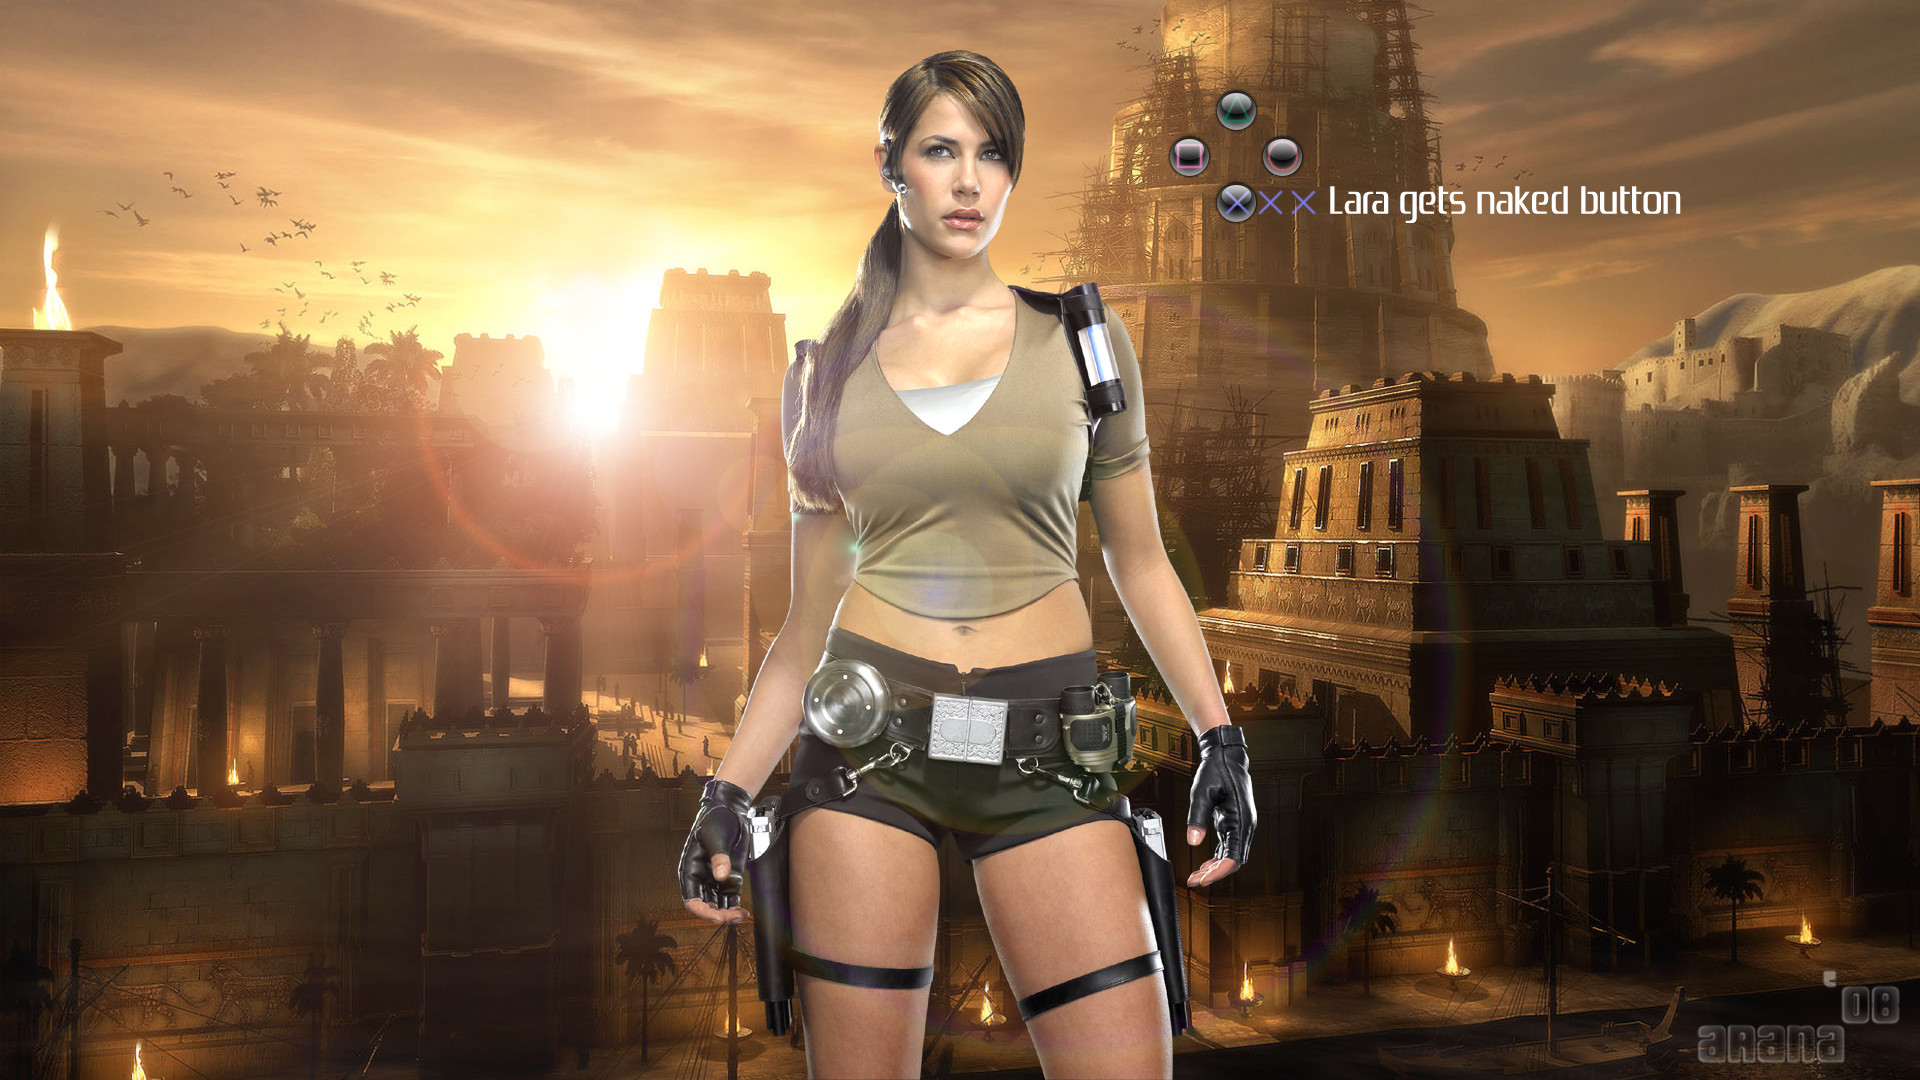 Lara Croft HDTV 1080p Wallpapers HD Wallpapers 1920x1080